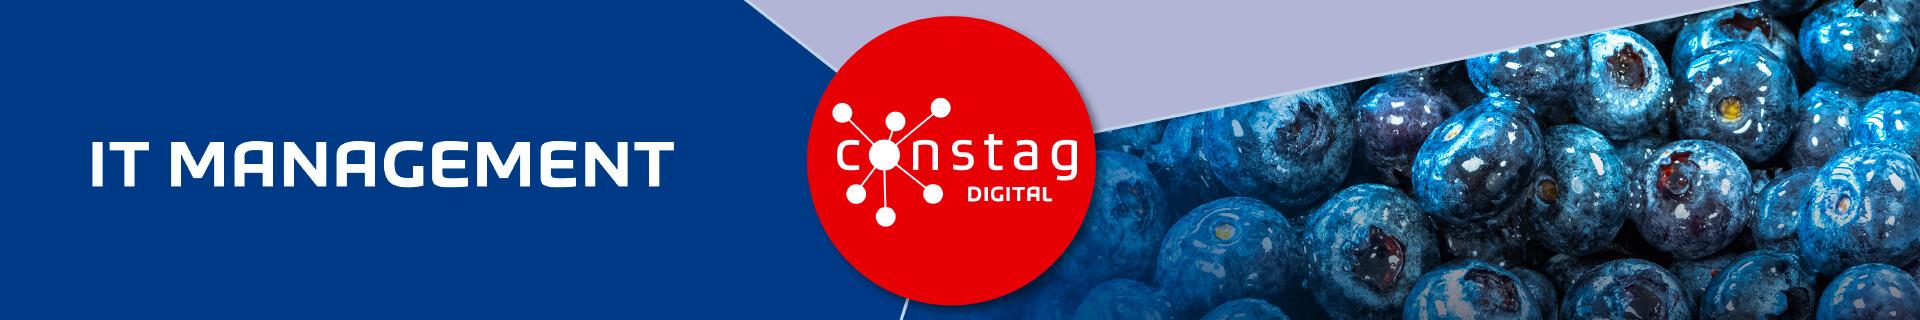 Constag Produkte IT-Management DIGITAL